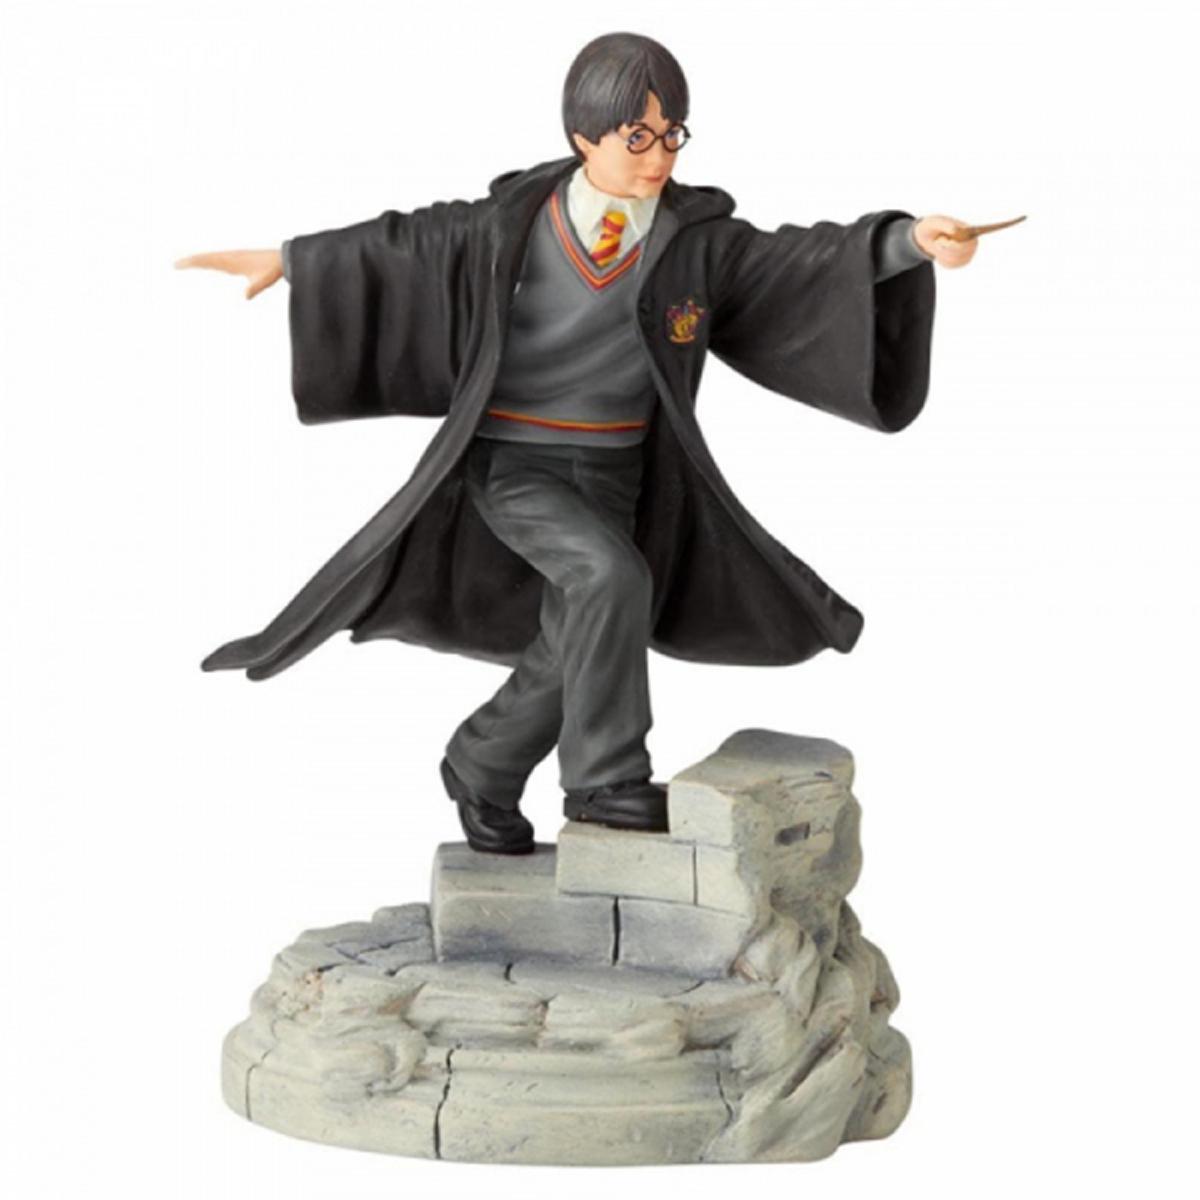 Figurine résine \'Harry Potter\' year one statue - 19x17x12 cm - [R2036]